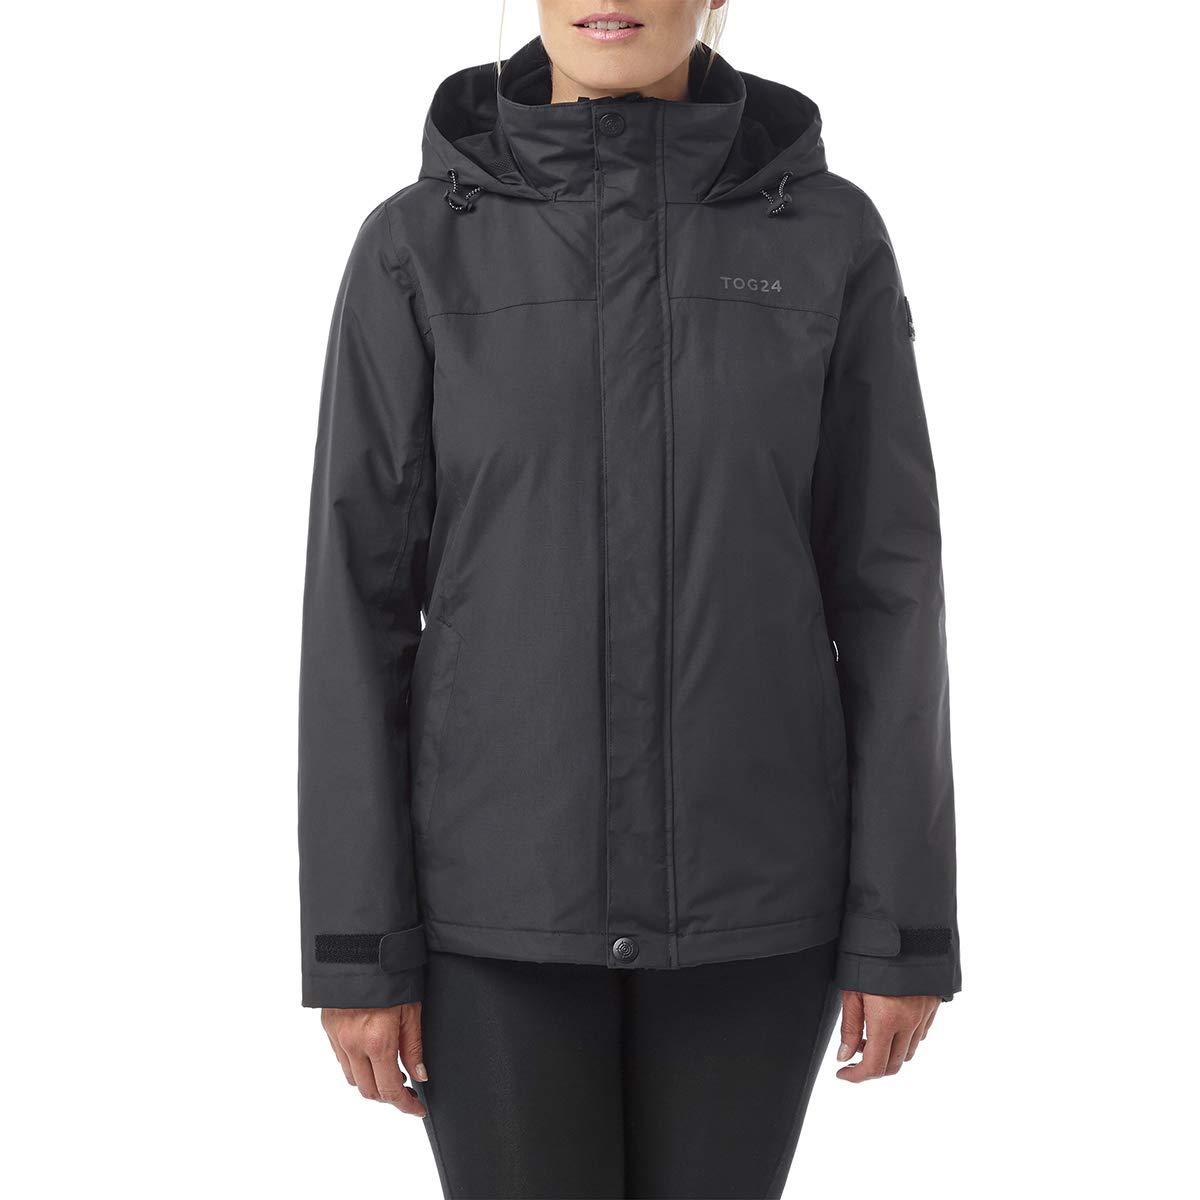 d46c5eced Tog24 Kildale Womens Waterproof 3 in 1 Jacket: Amazon.co.uk: Clothing